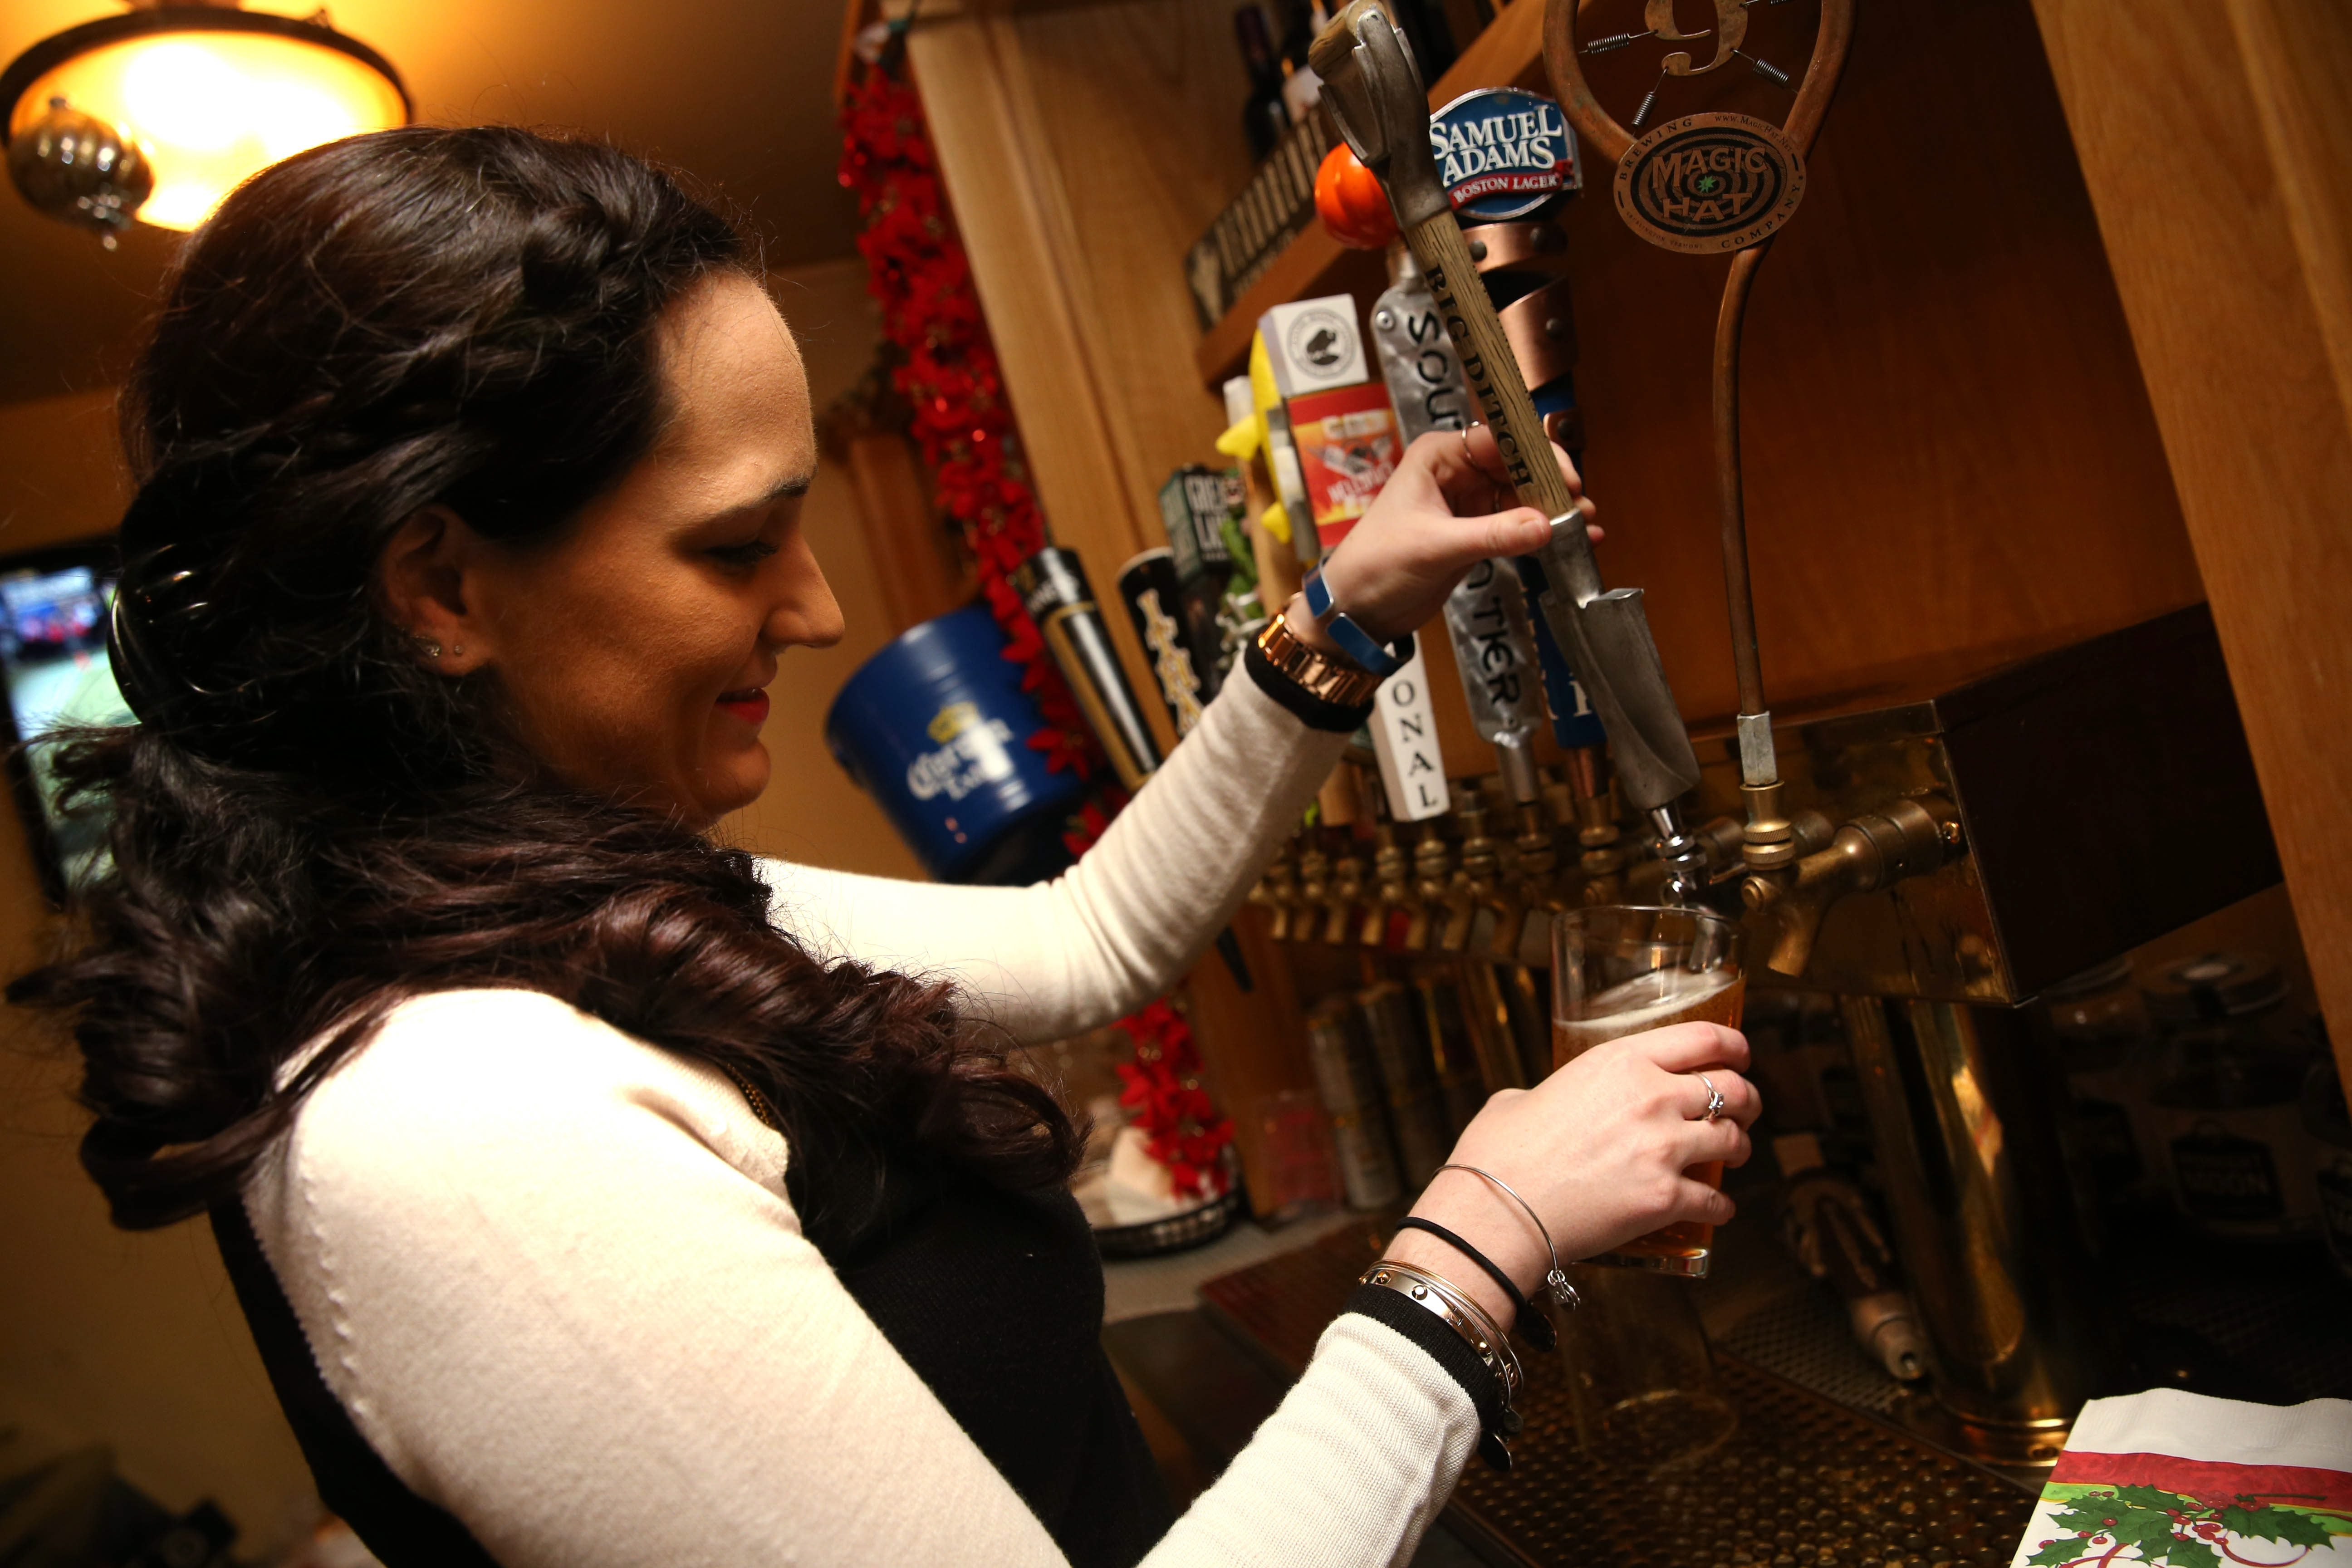 Armor Inn Tap Room is at 5381 Abbott Road in Hamburg. Bartender Allison Keane pours a Bif Ditch Hayburner which is brewed in Buffalo.  Photo taken, Saturday, Dec. 12, 2015.  (Sharon Cantillon/Buffalo News)